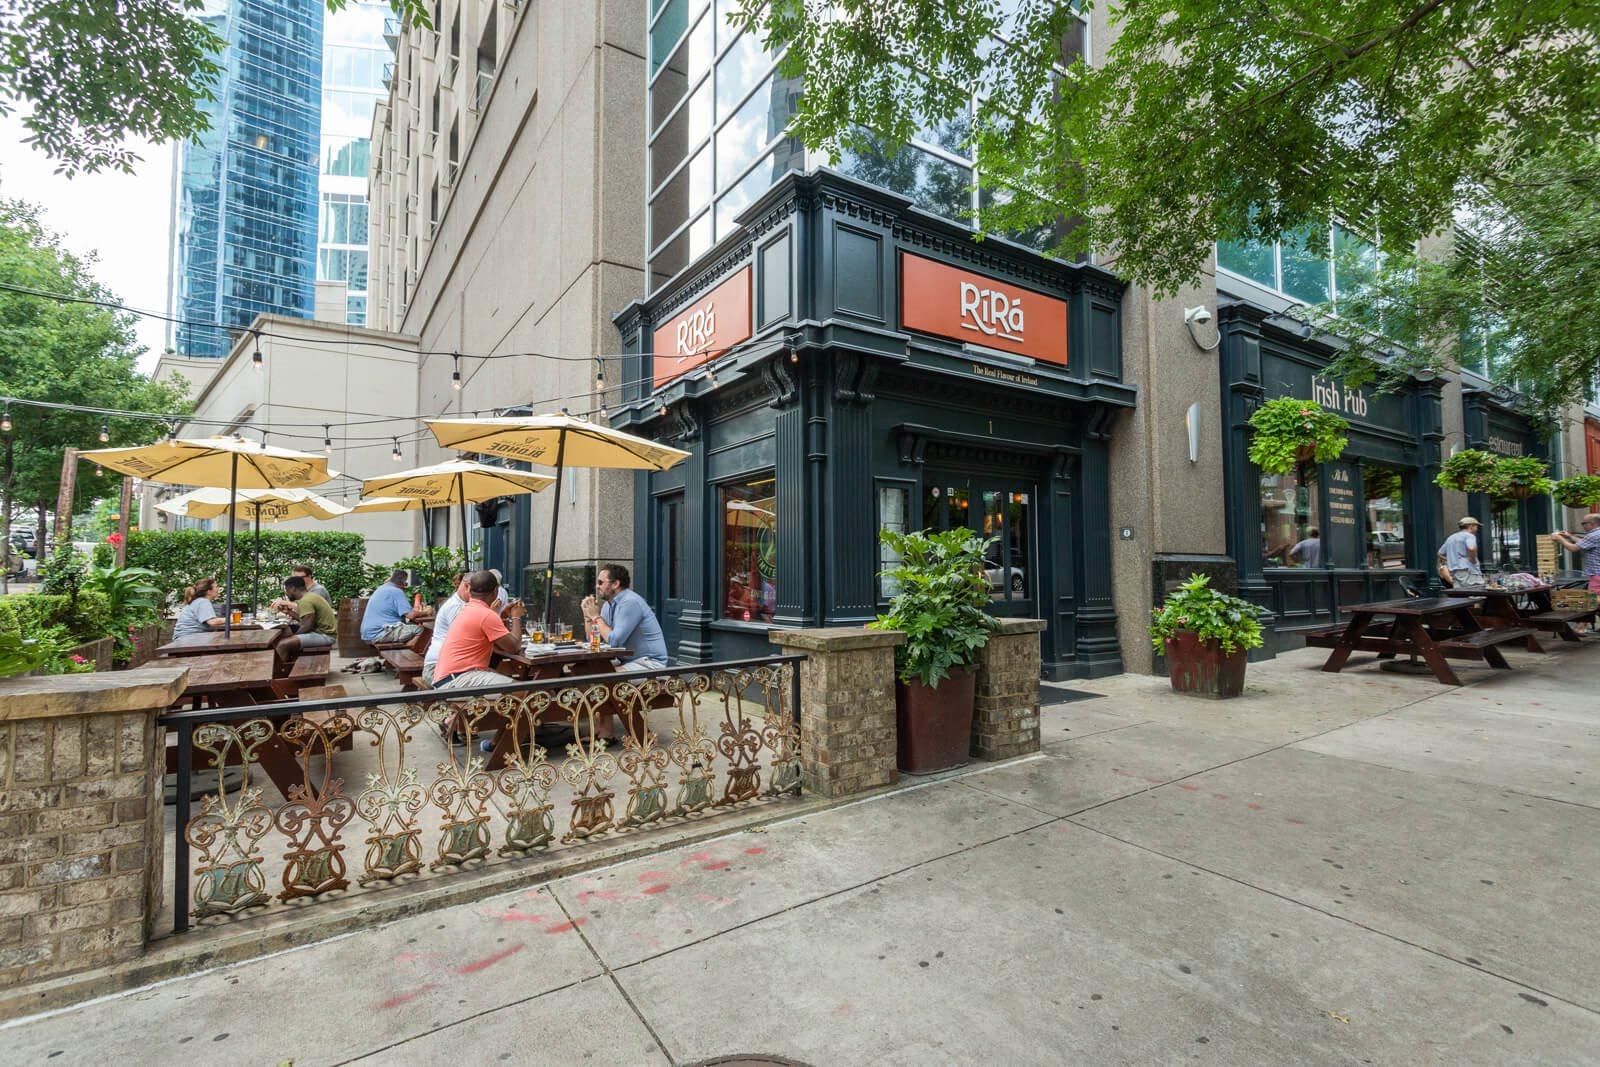 Enjoy the Midtown Neighborhood around Windsor at Midtown, 222 14th Street NE, Atlanta